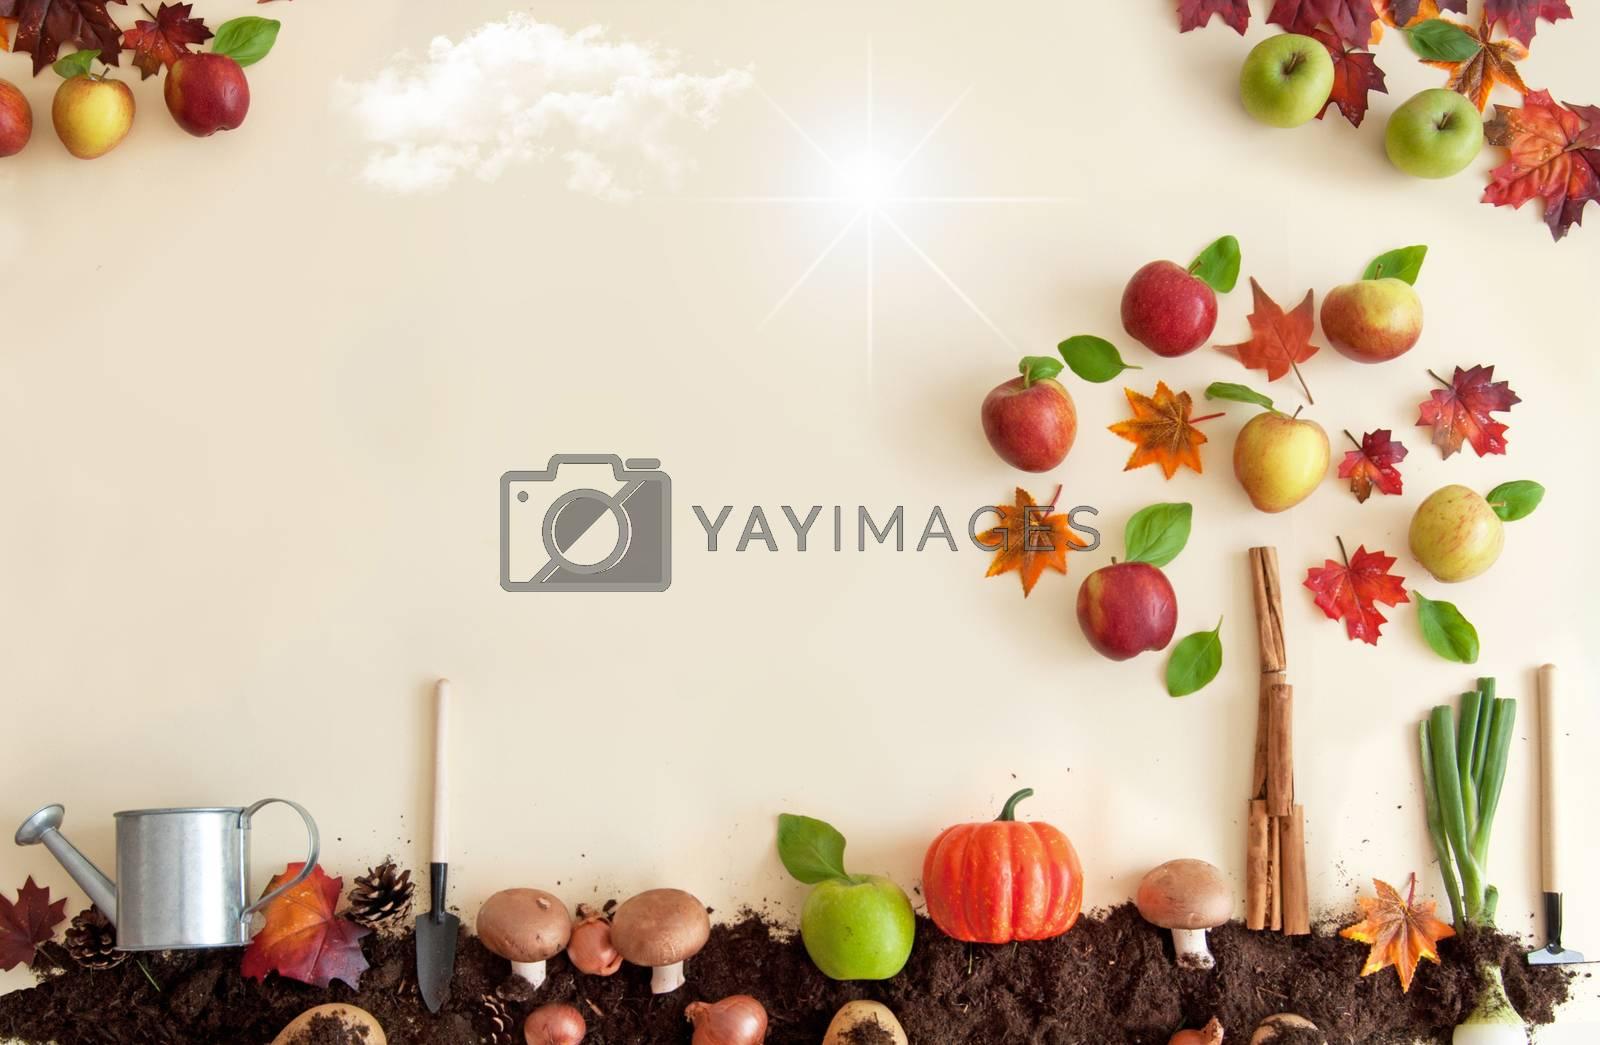 Royalty free image of Autumn season orchard background by unikpix